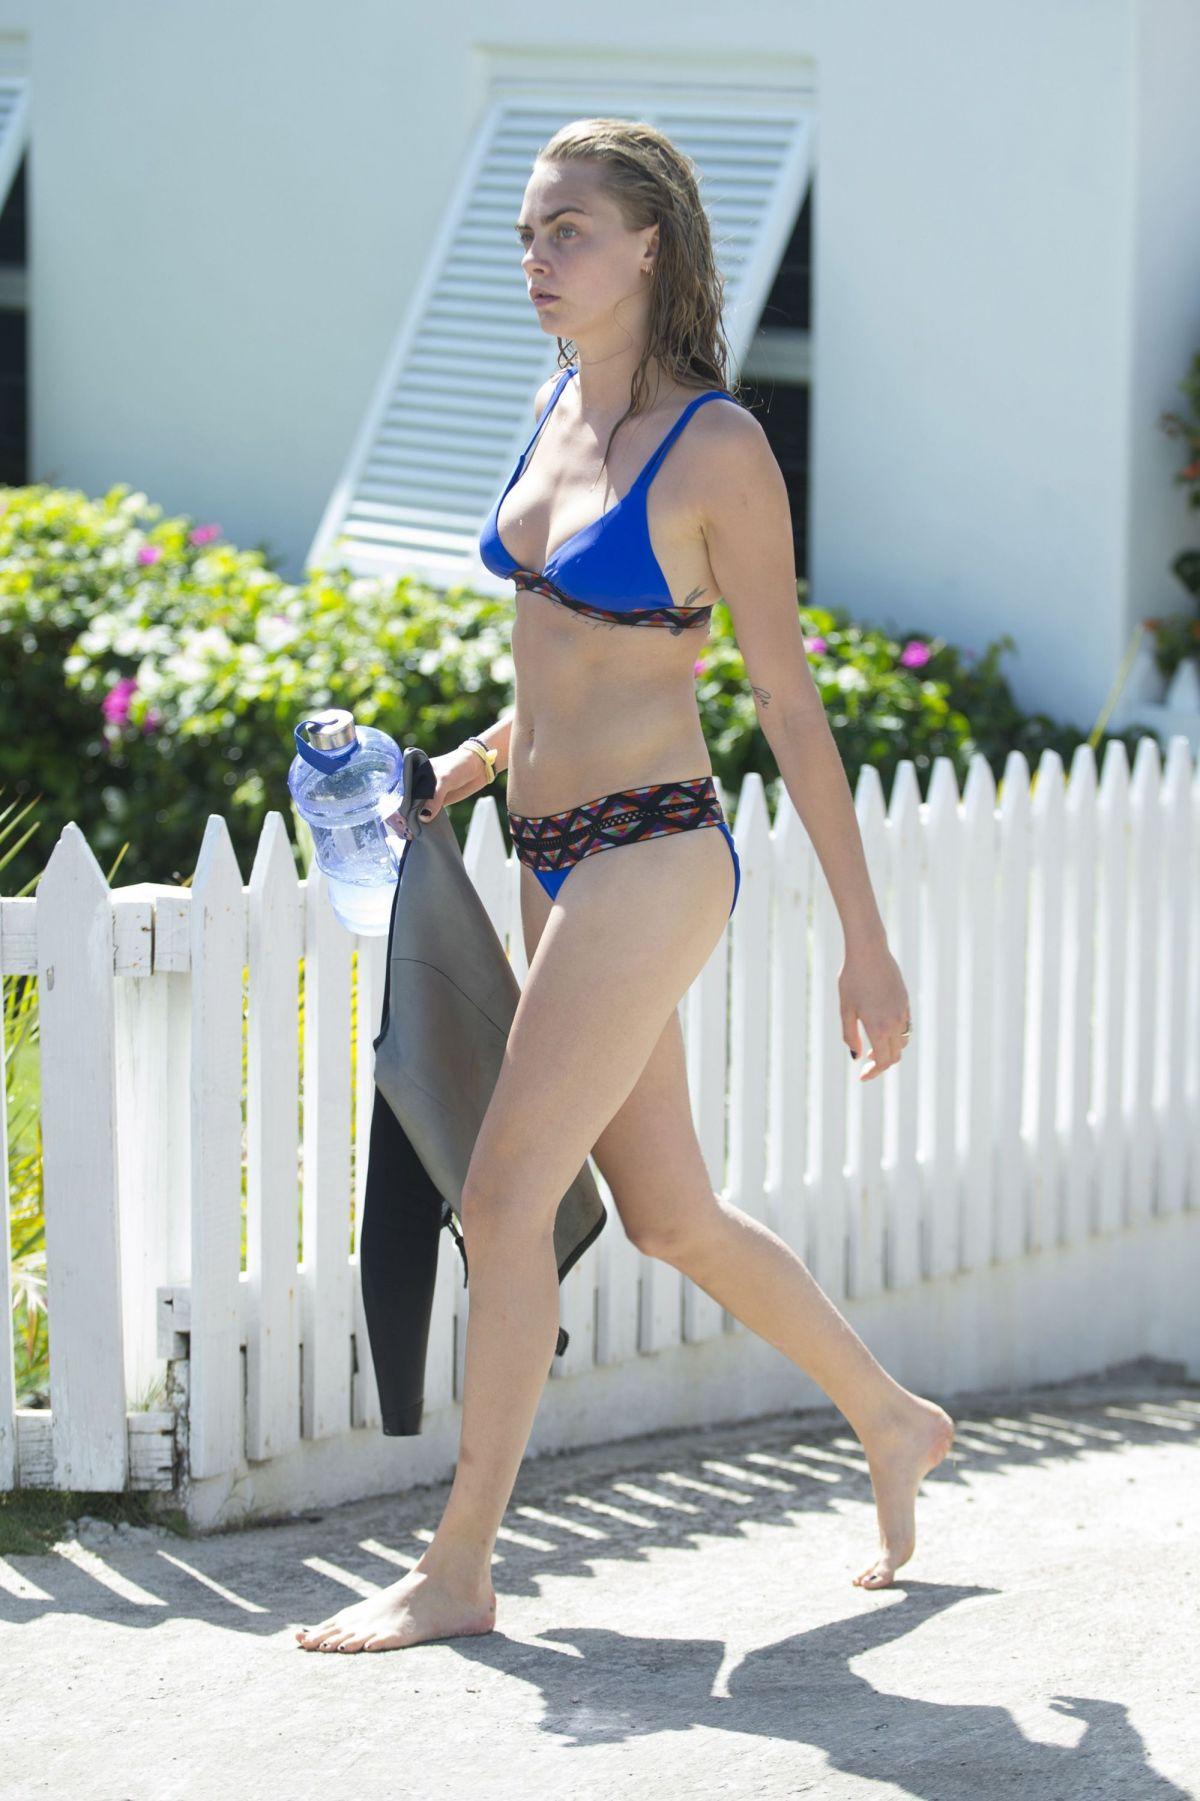 CARA DELEVINGNE in Bikini at a Beach in Barbados 01/01